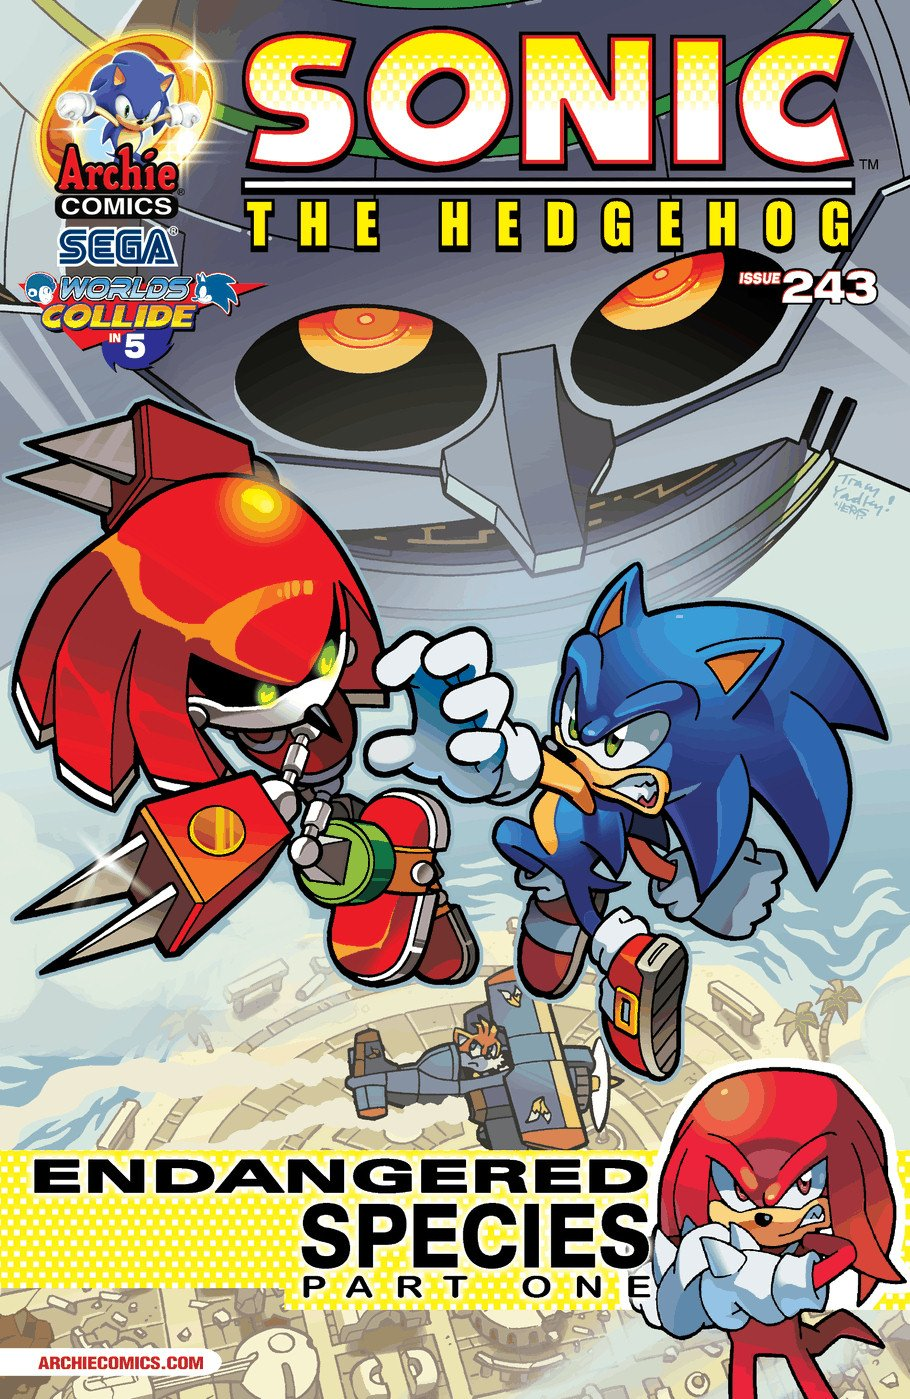 Sonic the Hedgehog 243 (January 2013)